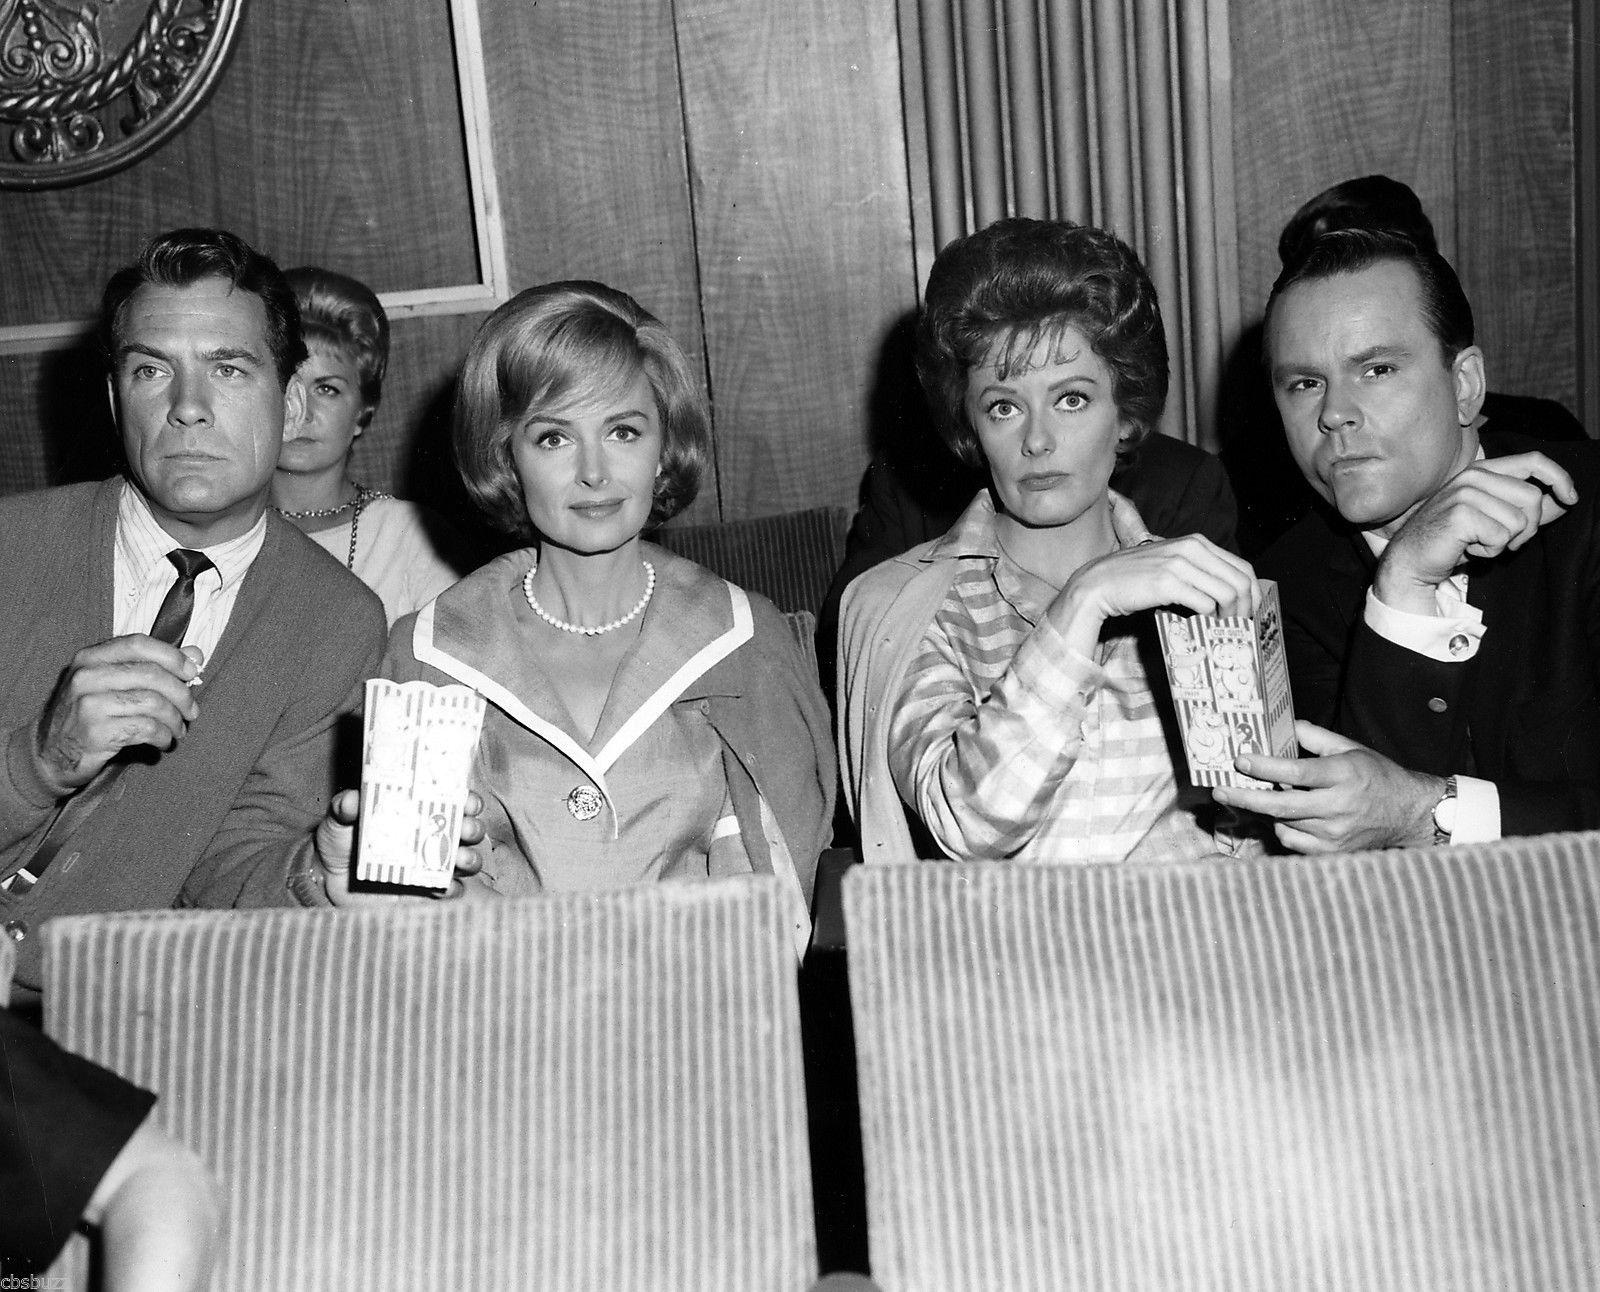 Carl Betz, Donna Reed, Ann McCrea & Bob Crane eating popcorn